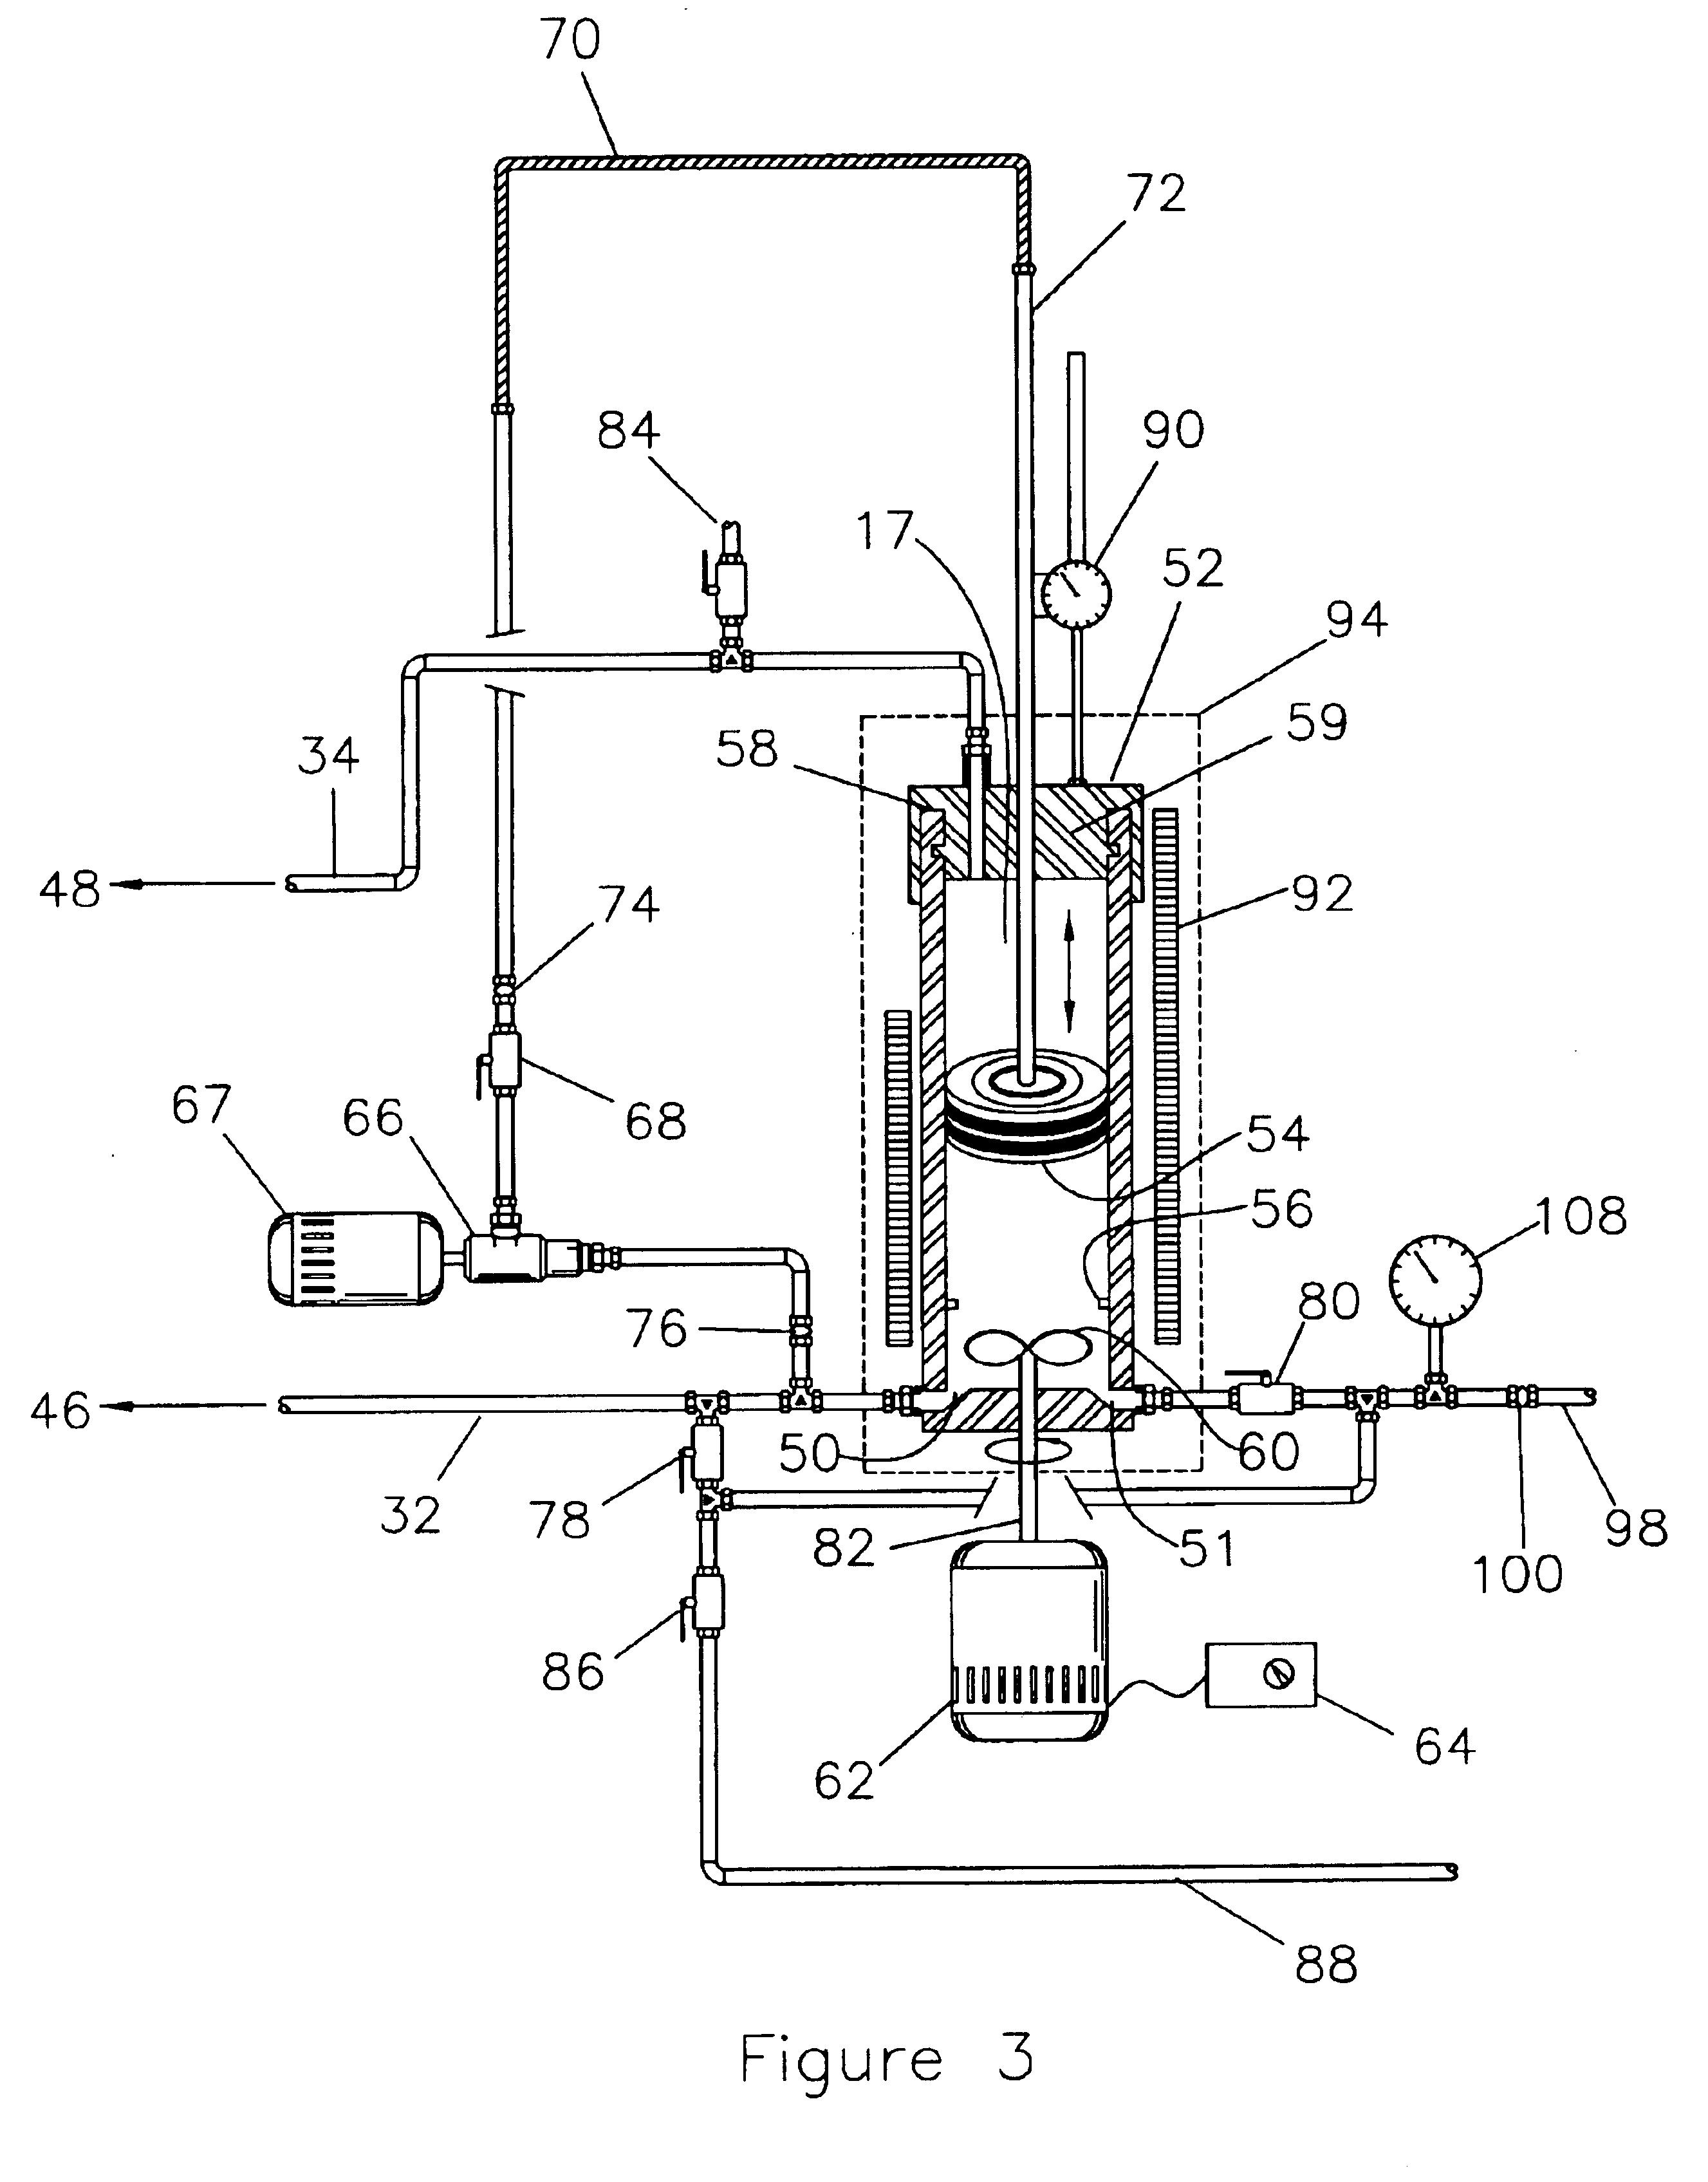 magnet coil generator diagram patent us6807849 - foam generator and viscometer apparatus ...